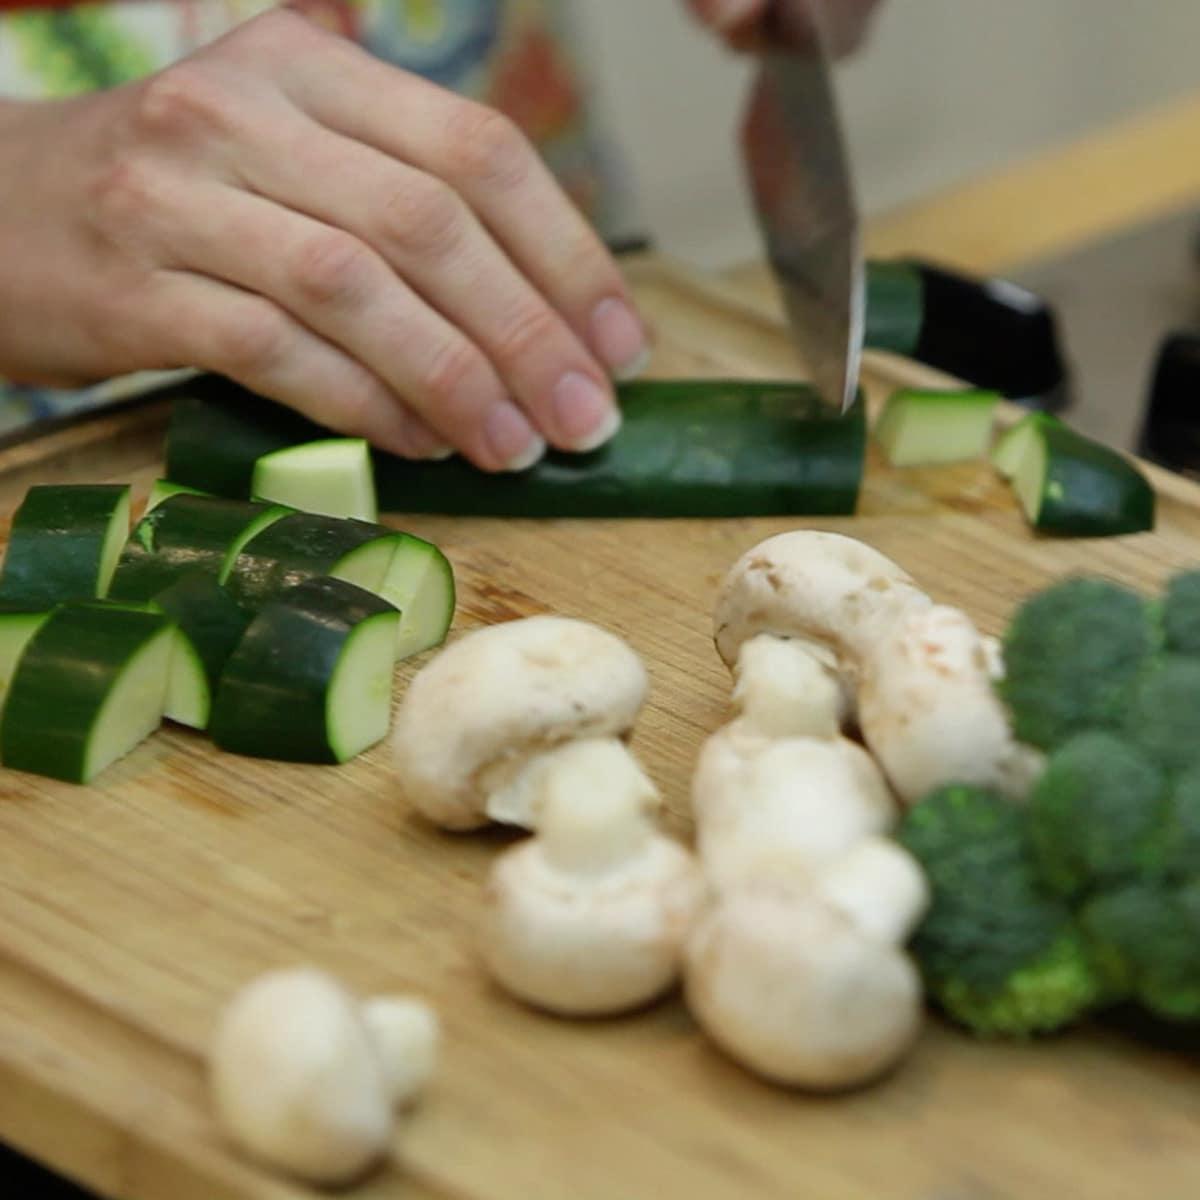 Roni Proter preparing chicken teriyaki stir fry